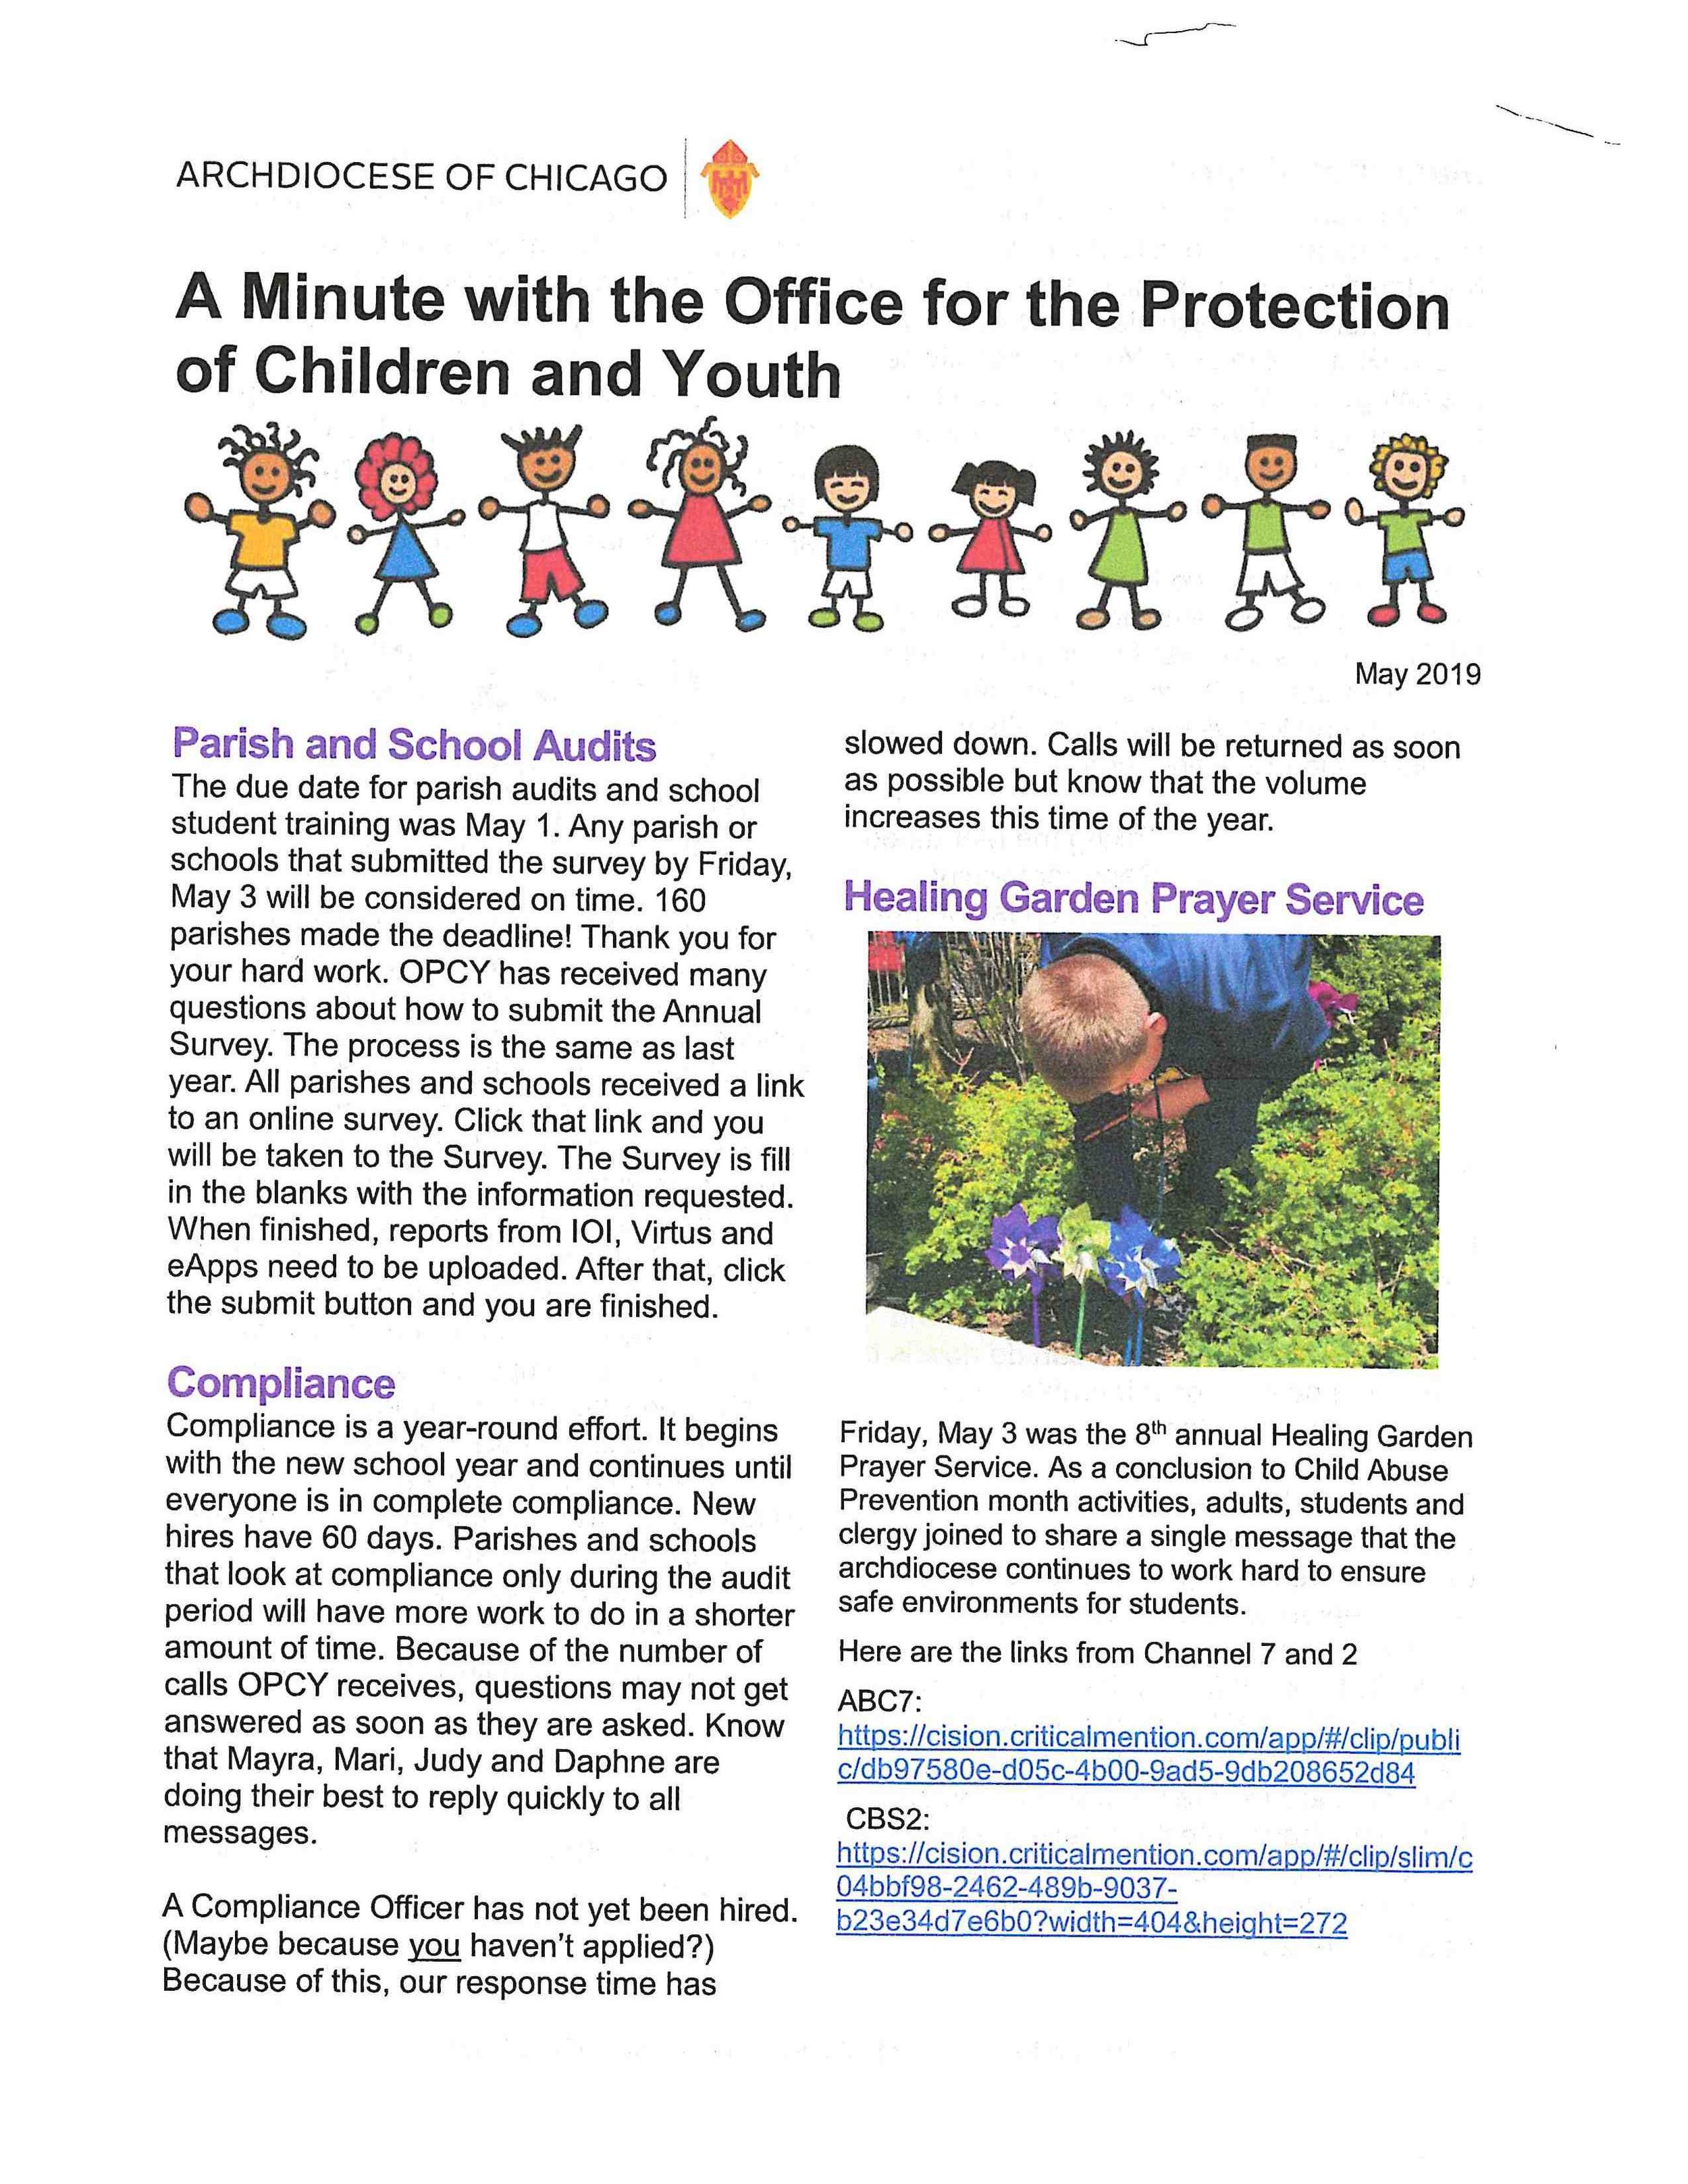 OfficeChildProtectionsUpdate_May2019.jpg